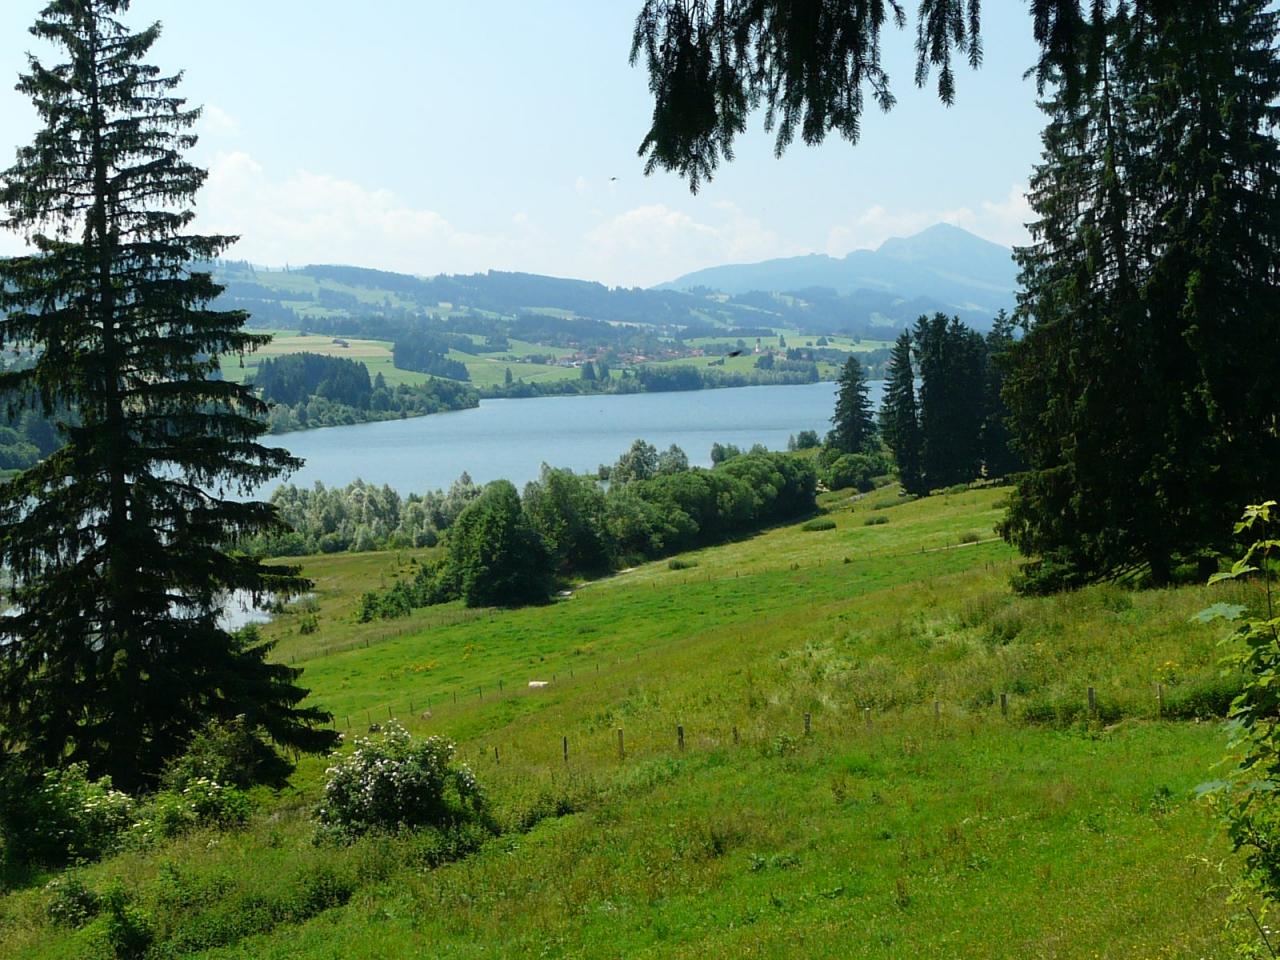 Вилла на озере Роттах в баварских Альпах